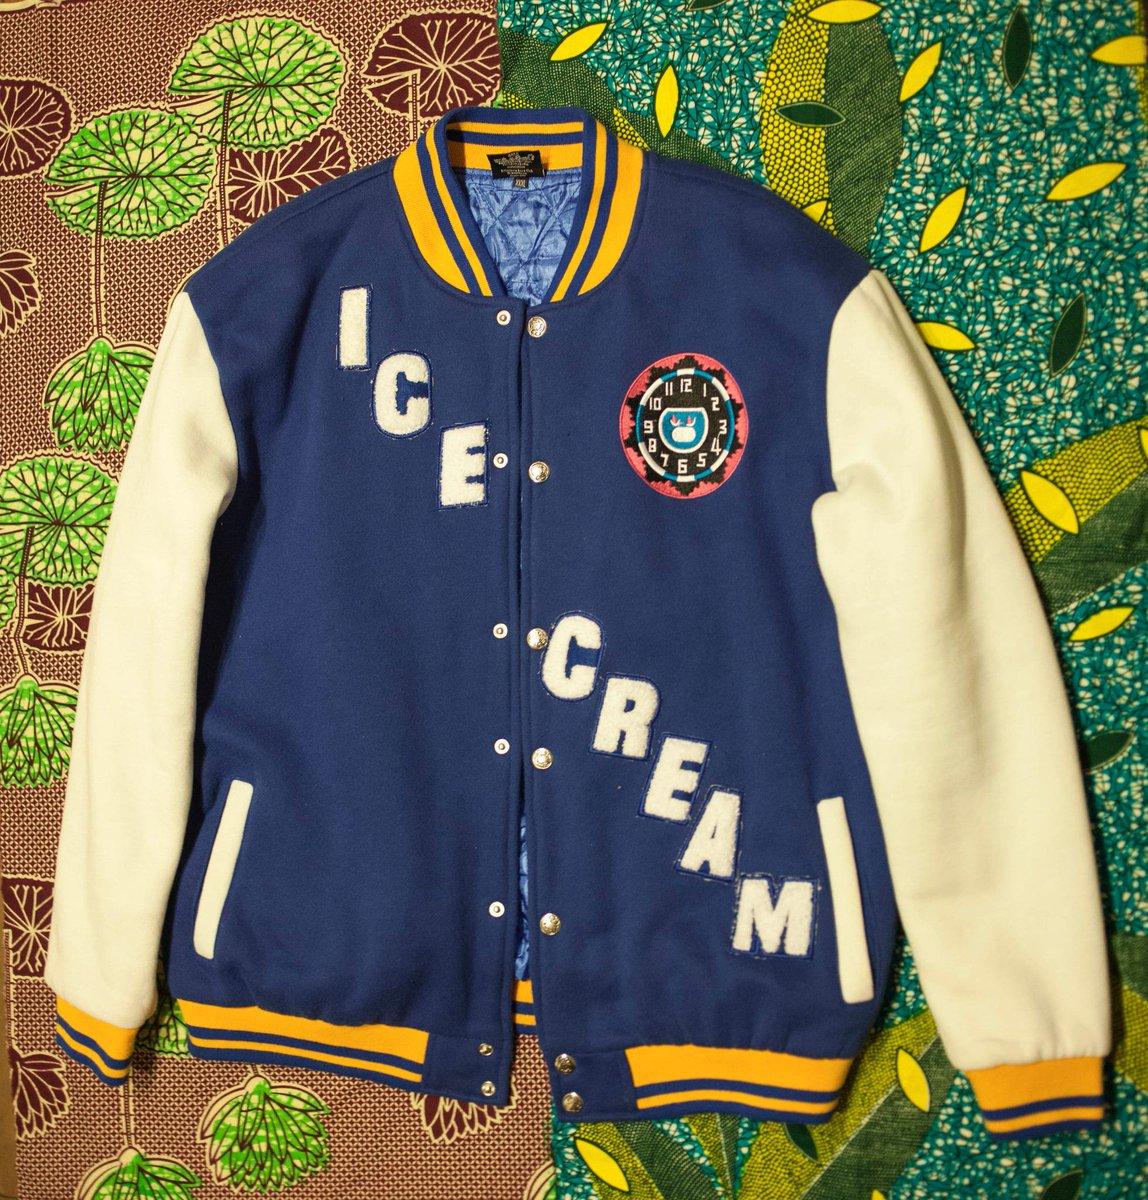 Bbc ice cream hoodie